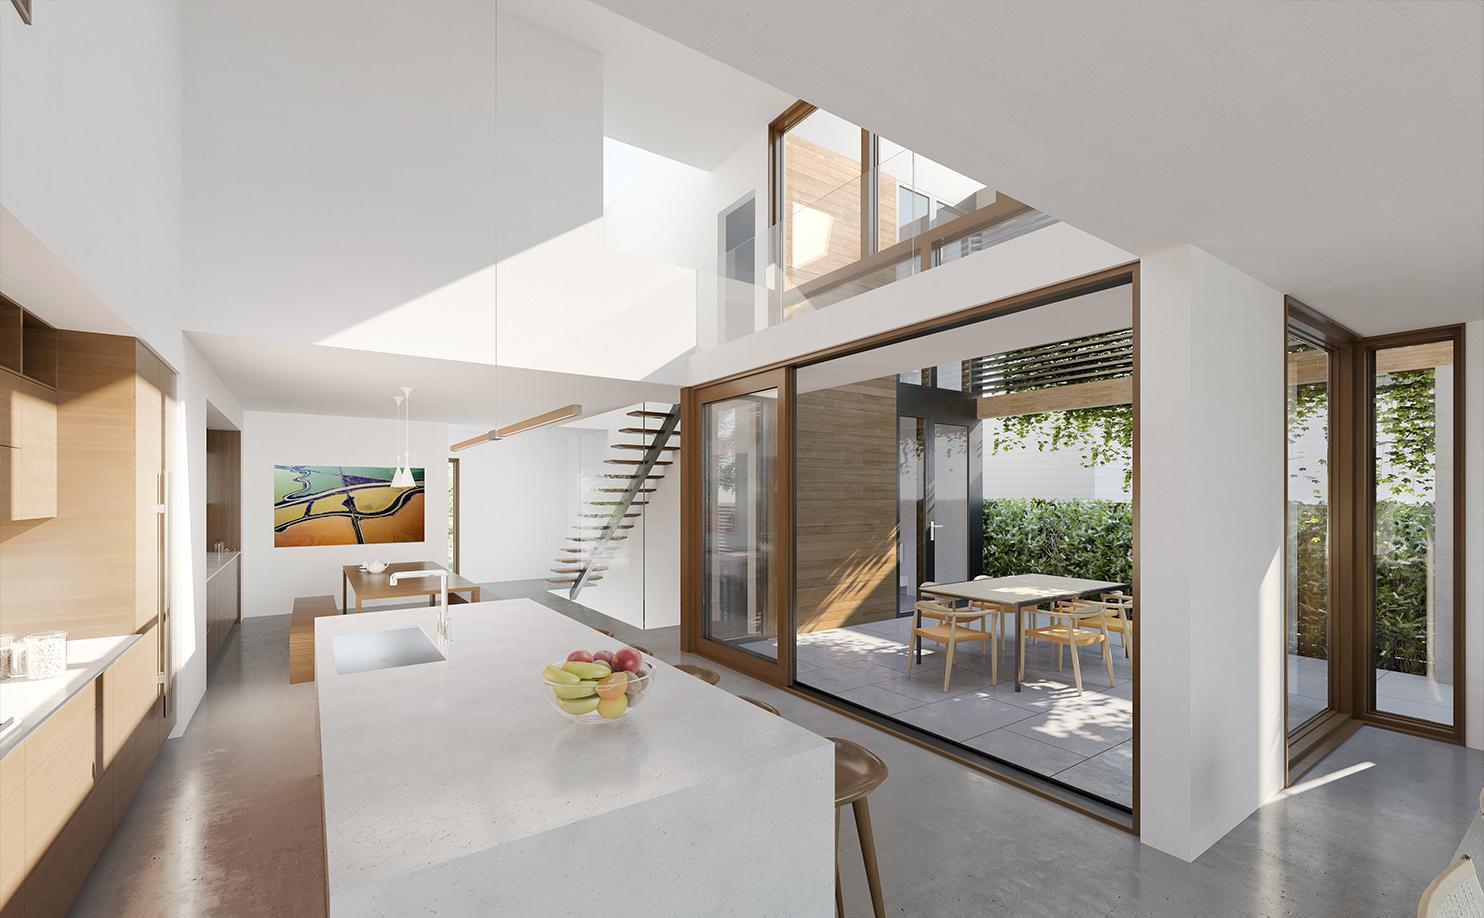 turkel_design_modern_prefab_home_axiom_series_rendering_axiom2610_interior.jpg